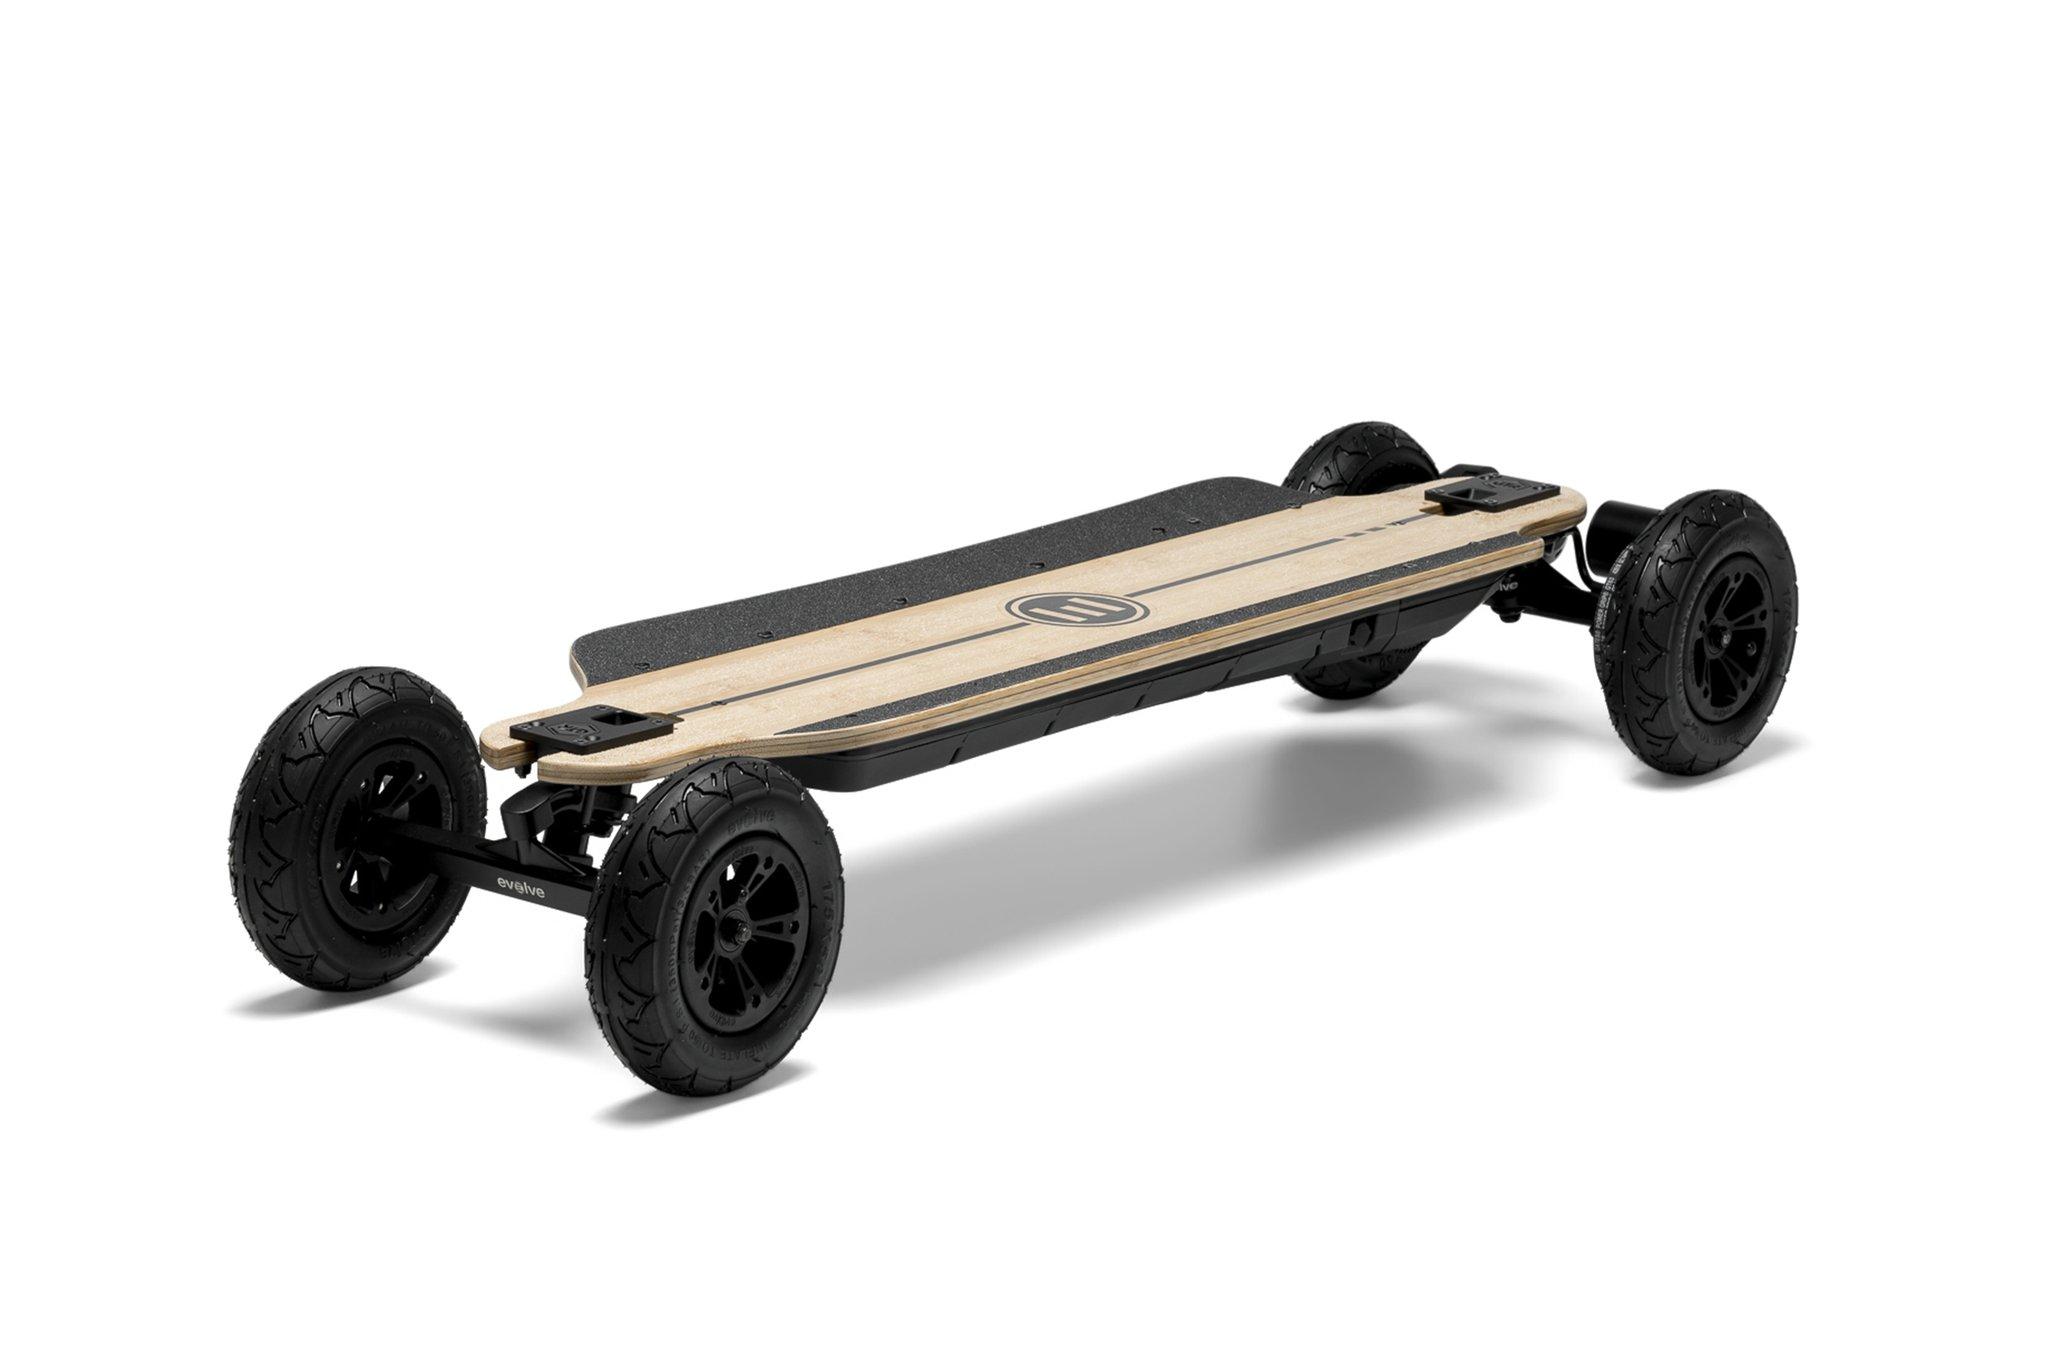 evolve bamboo gtr electric skateboard